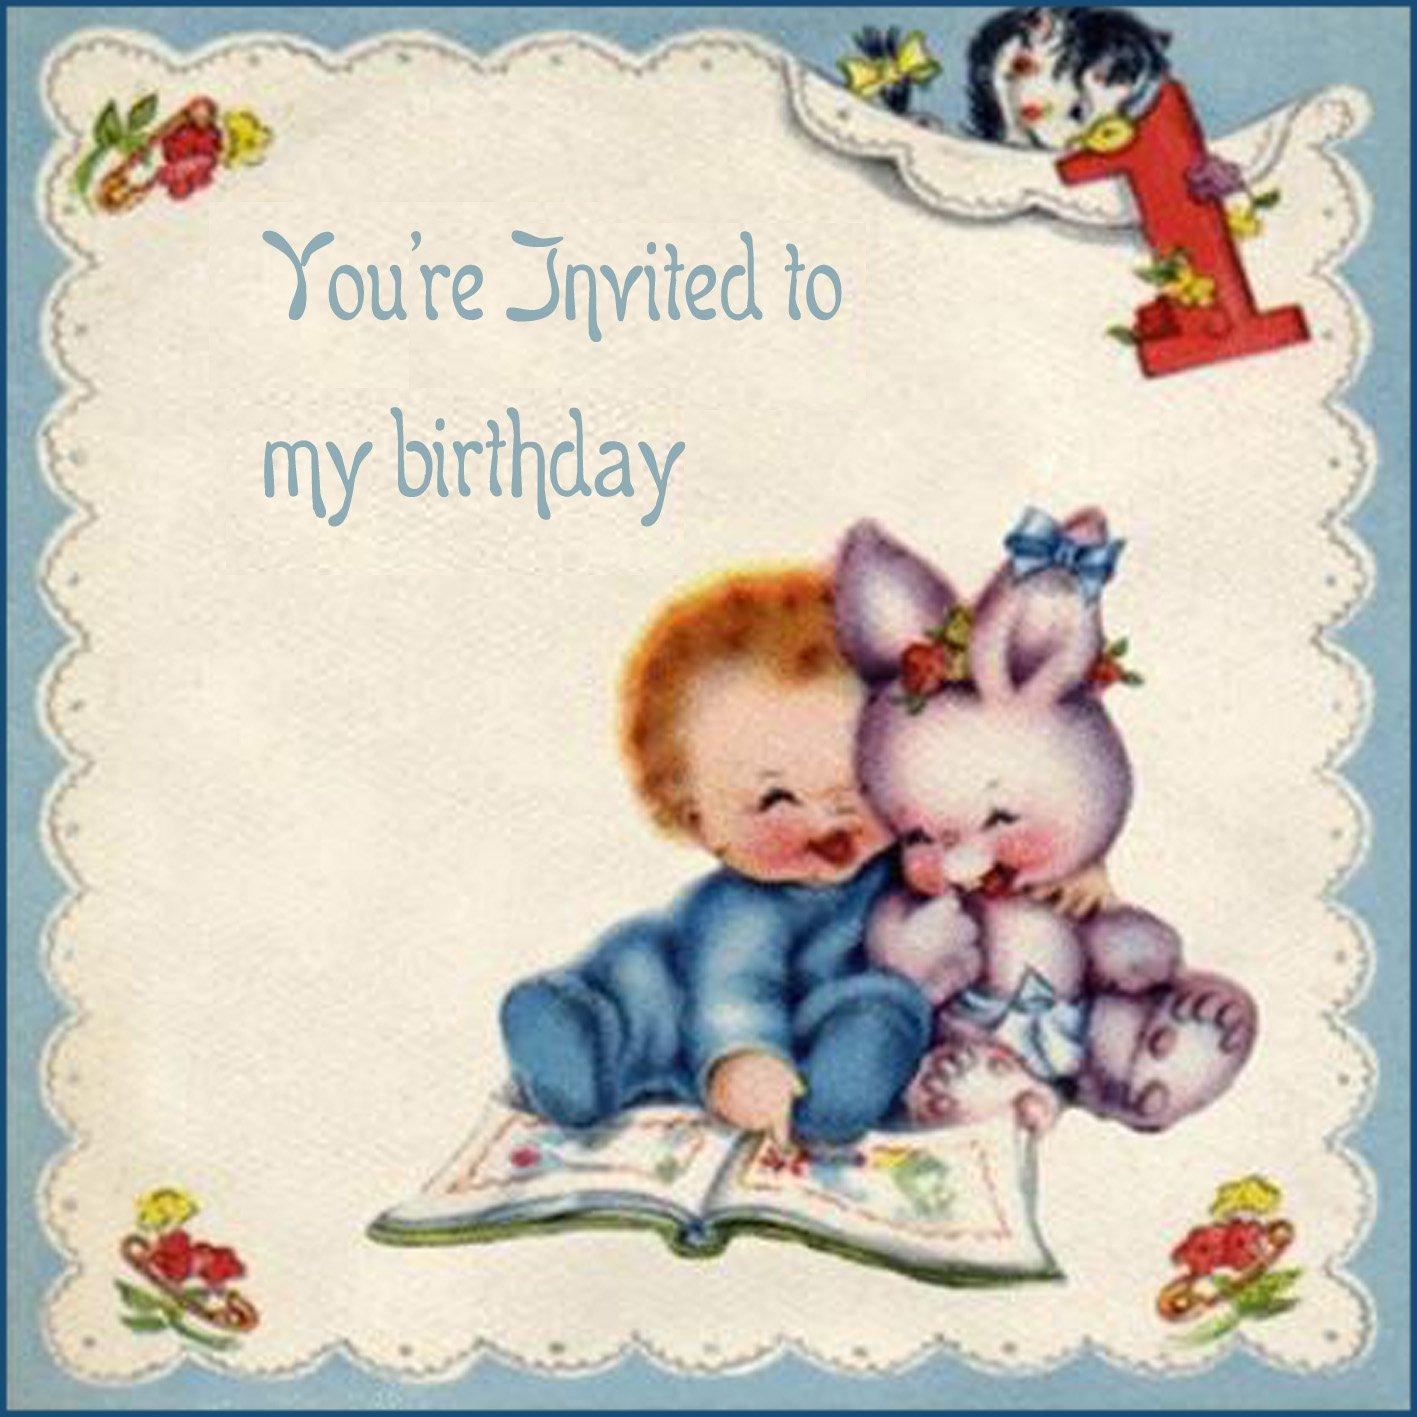 11 Year Old Birthday Invitations For Boy